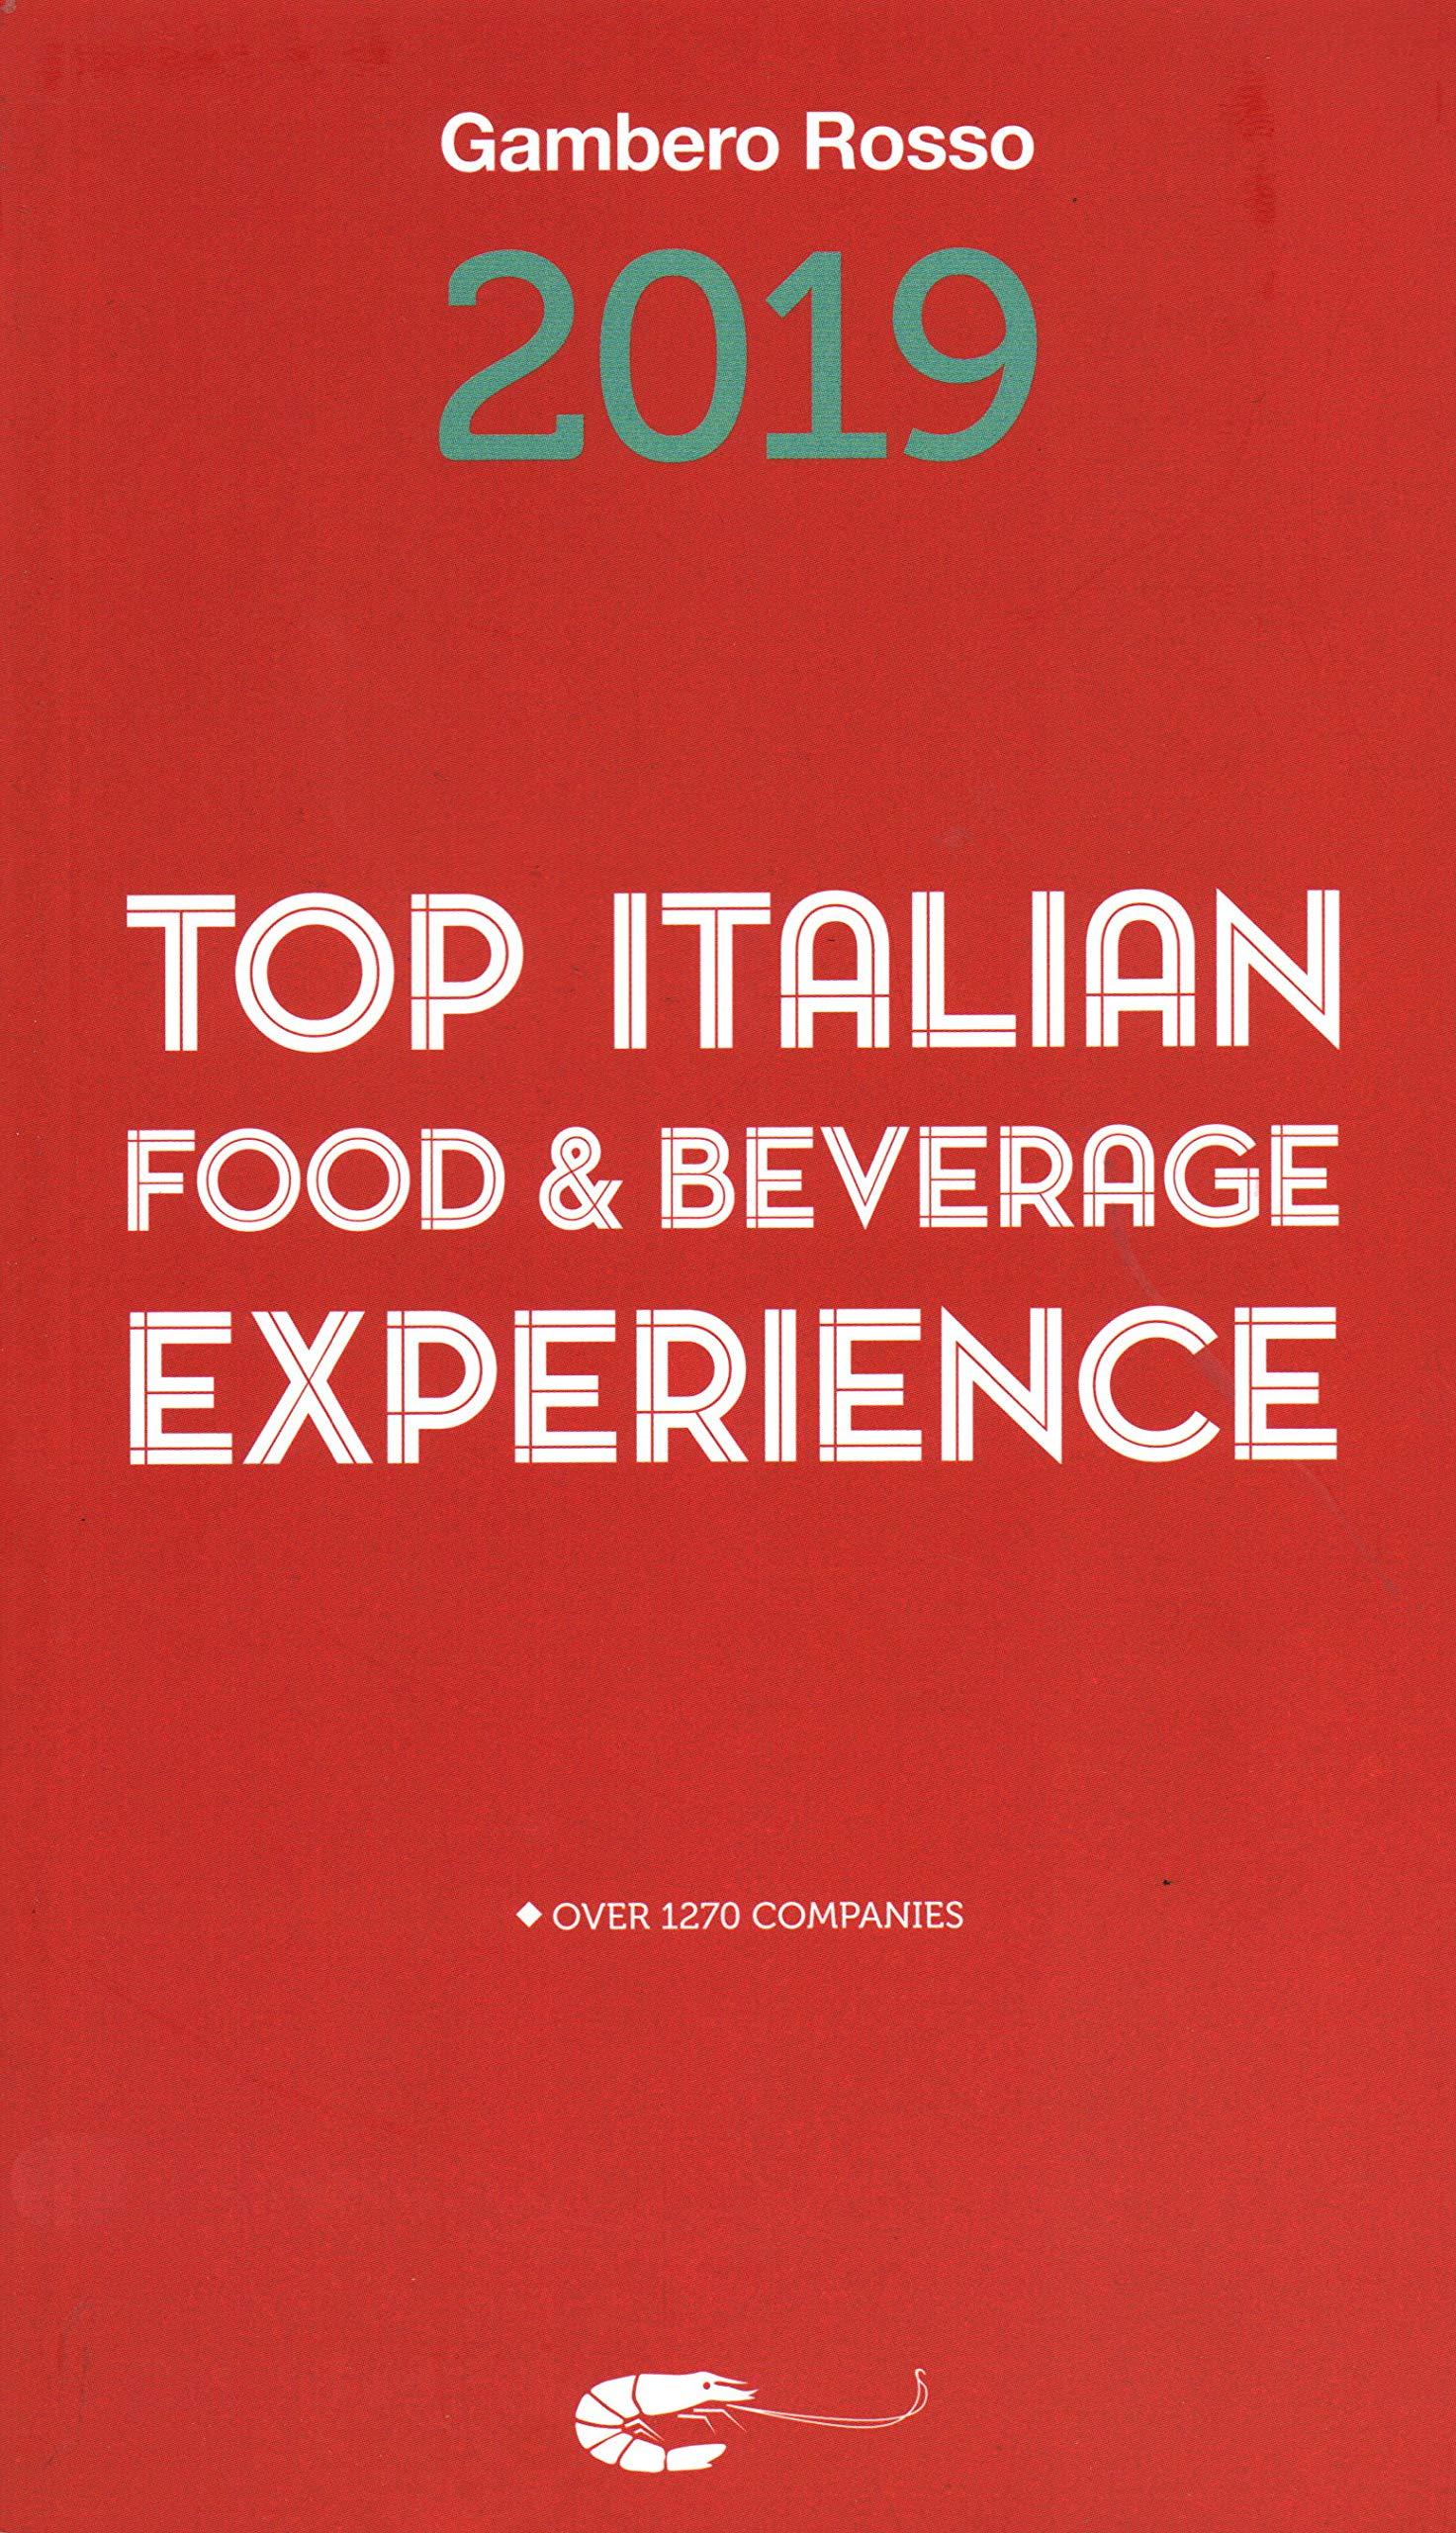 Top Italian Food & Beverage Experience 2019: Gambero Rosso